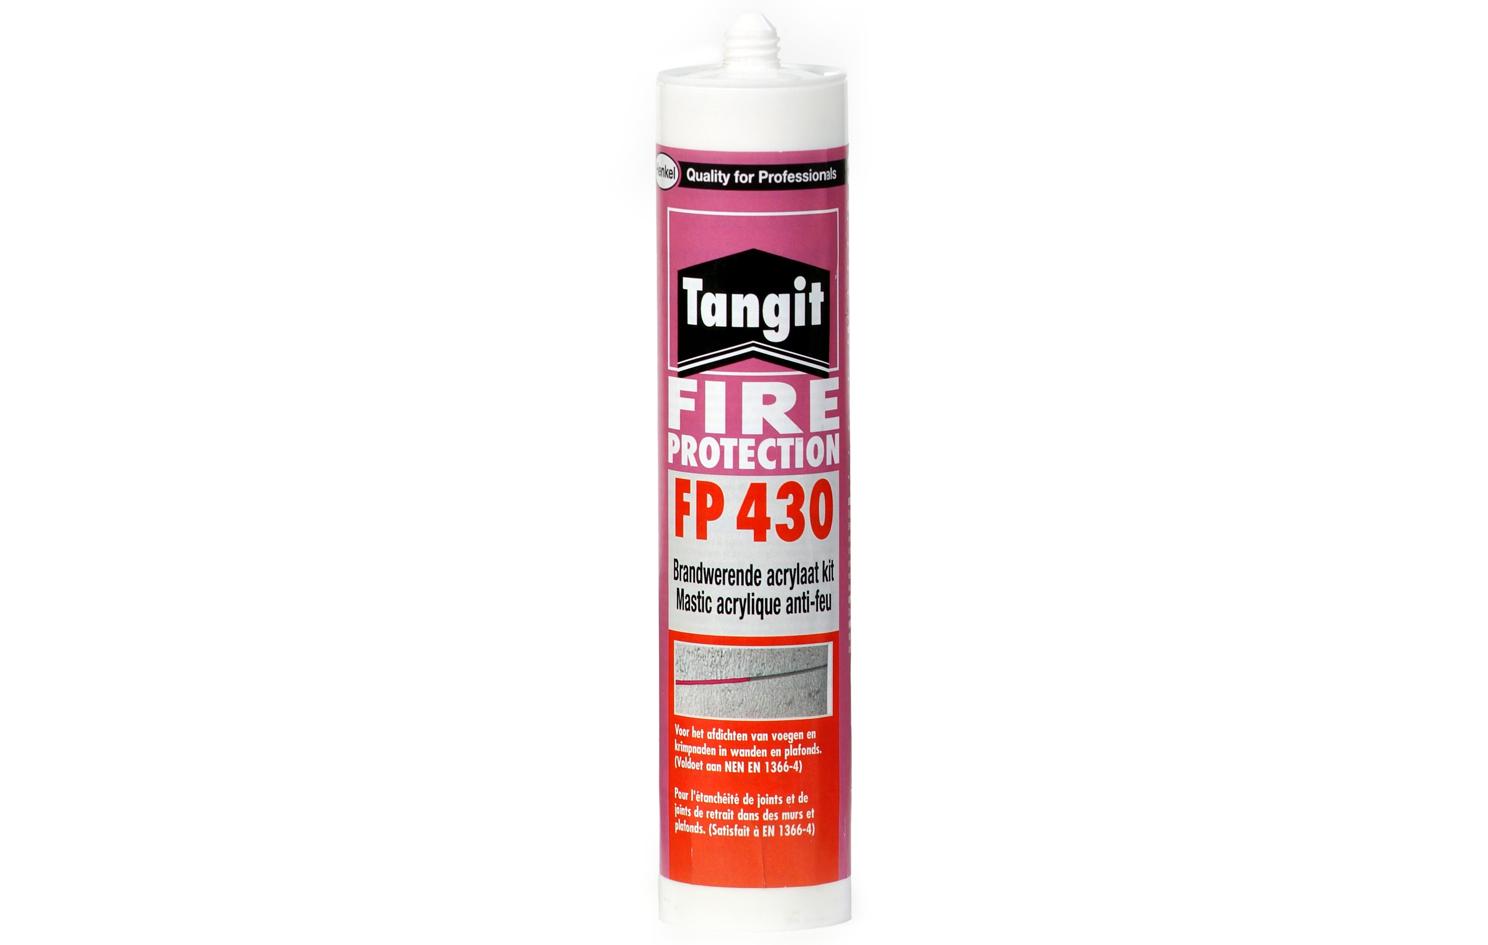 Tangit_FP_430_2181430.jpg